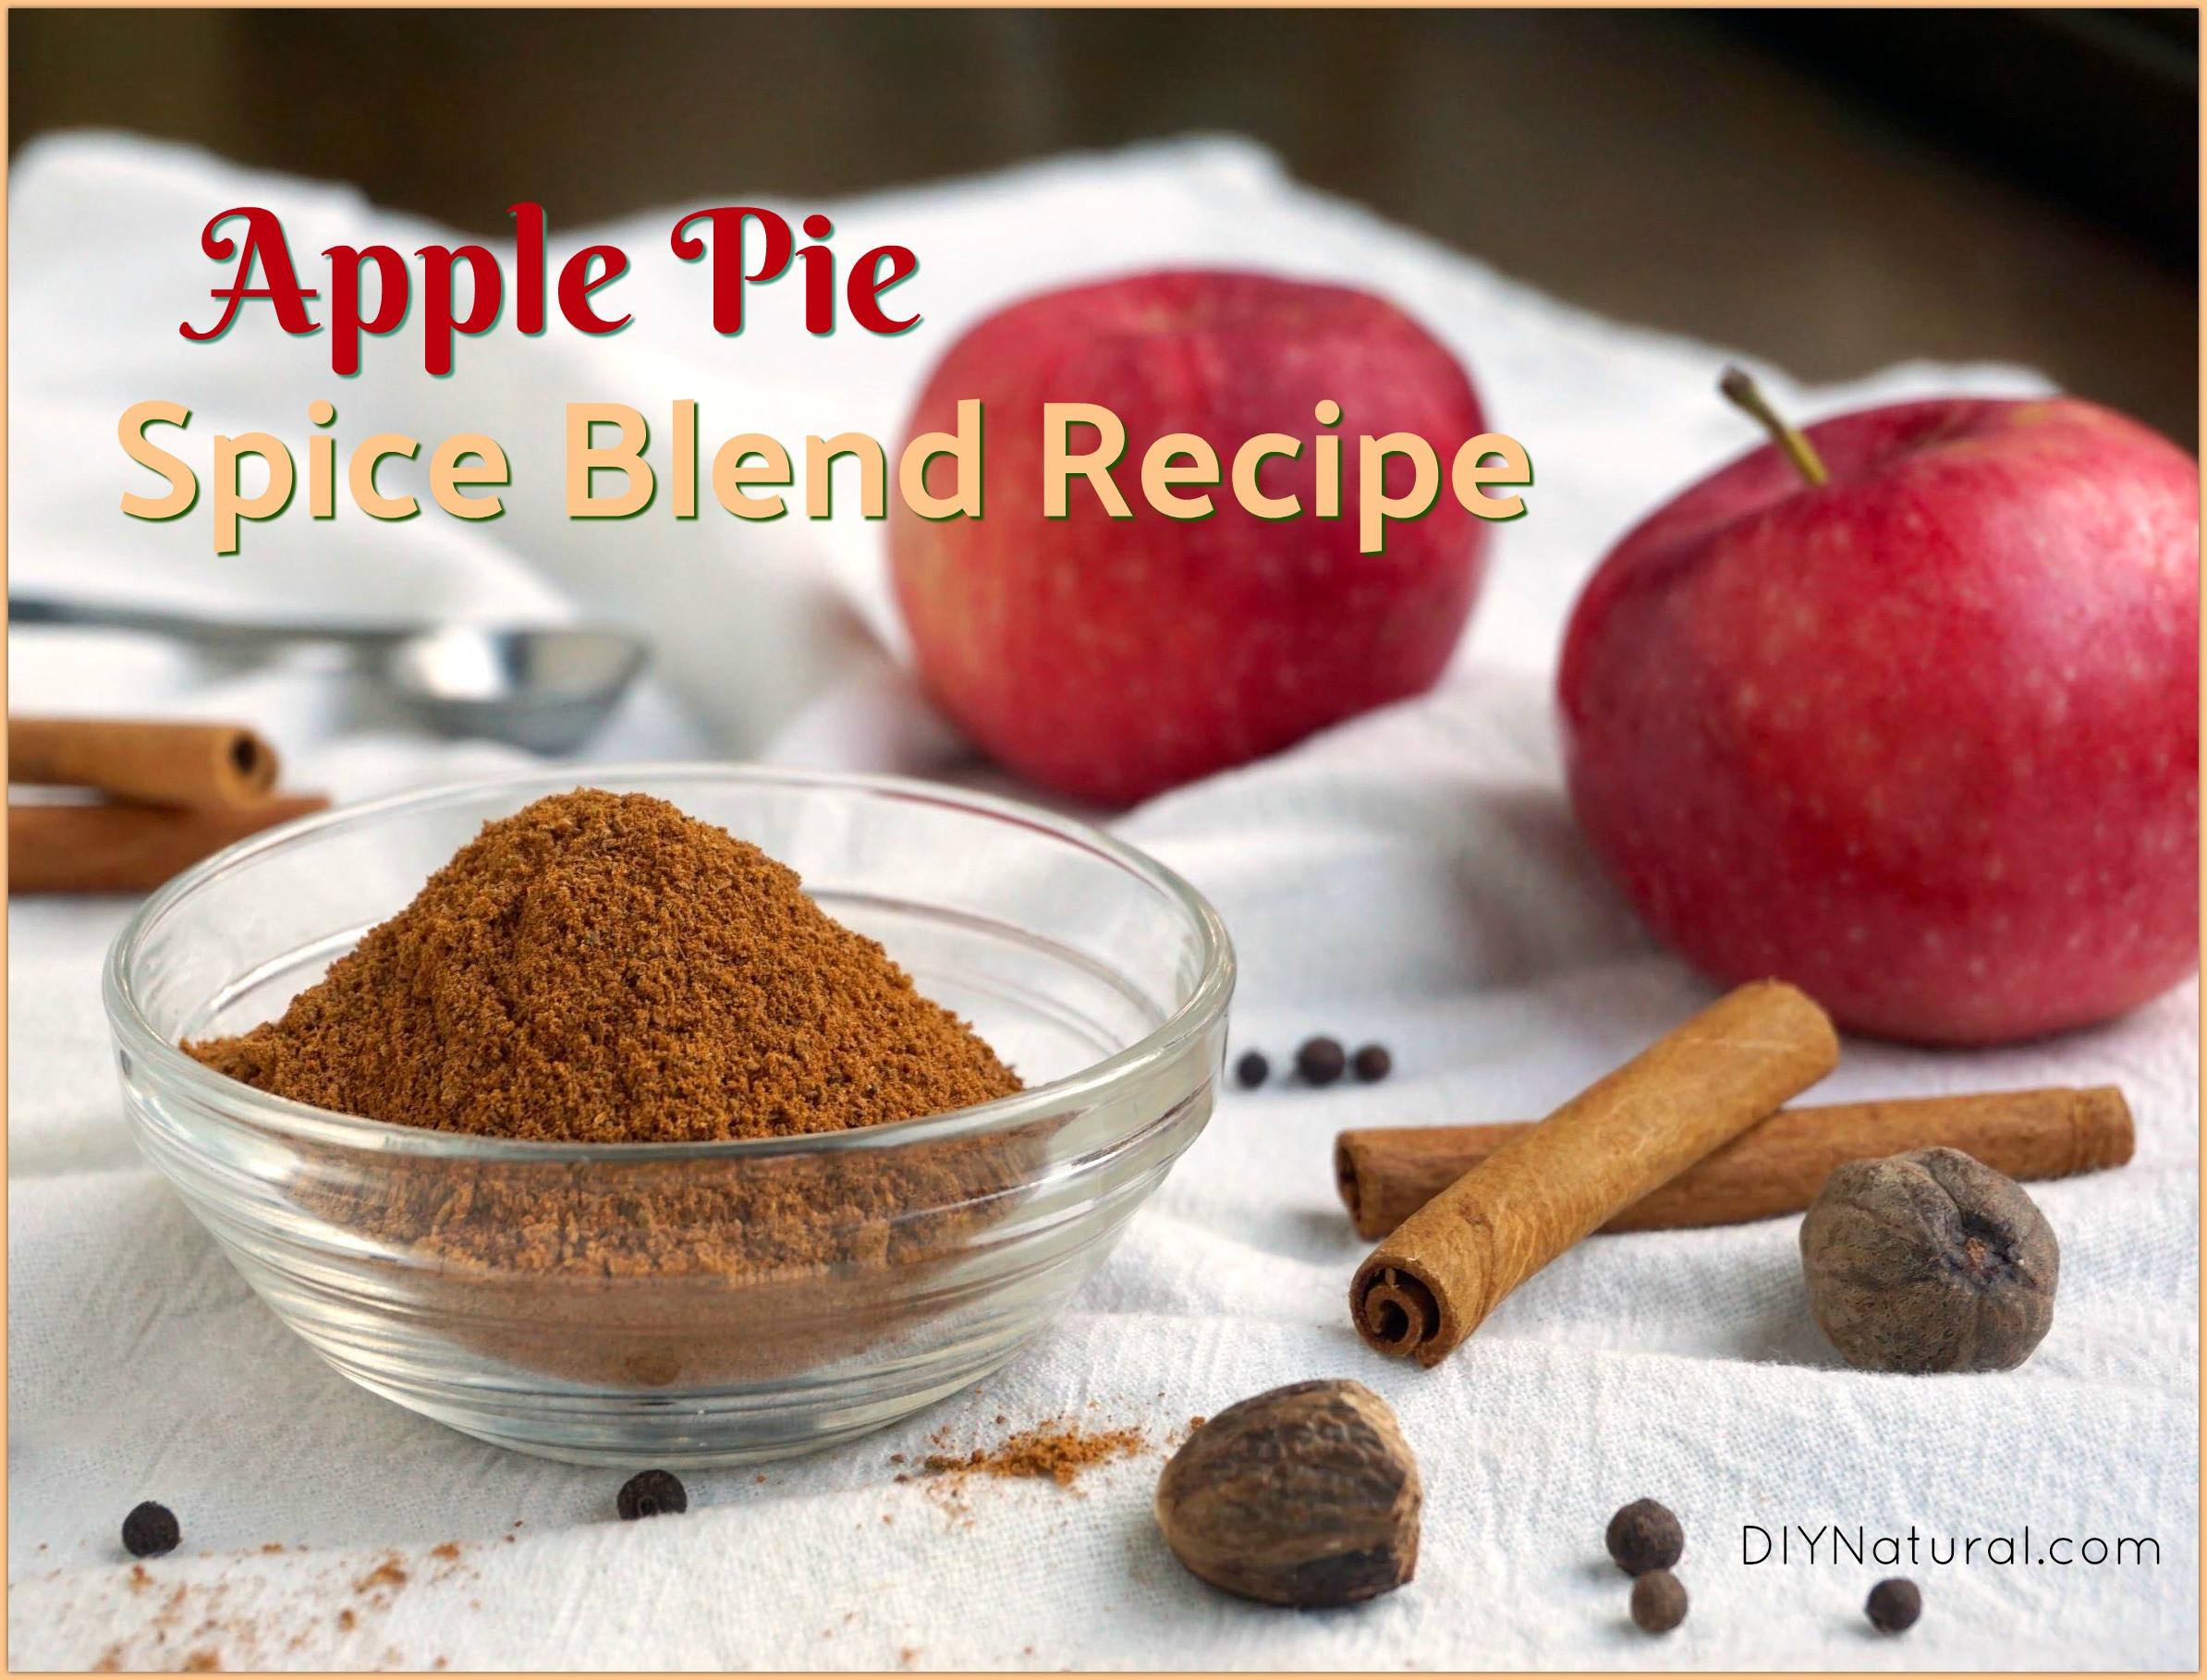 Apple Pie Spice  Apple Pie Spice Recipe Learn to Make Your Own Apple Pie Spice